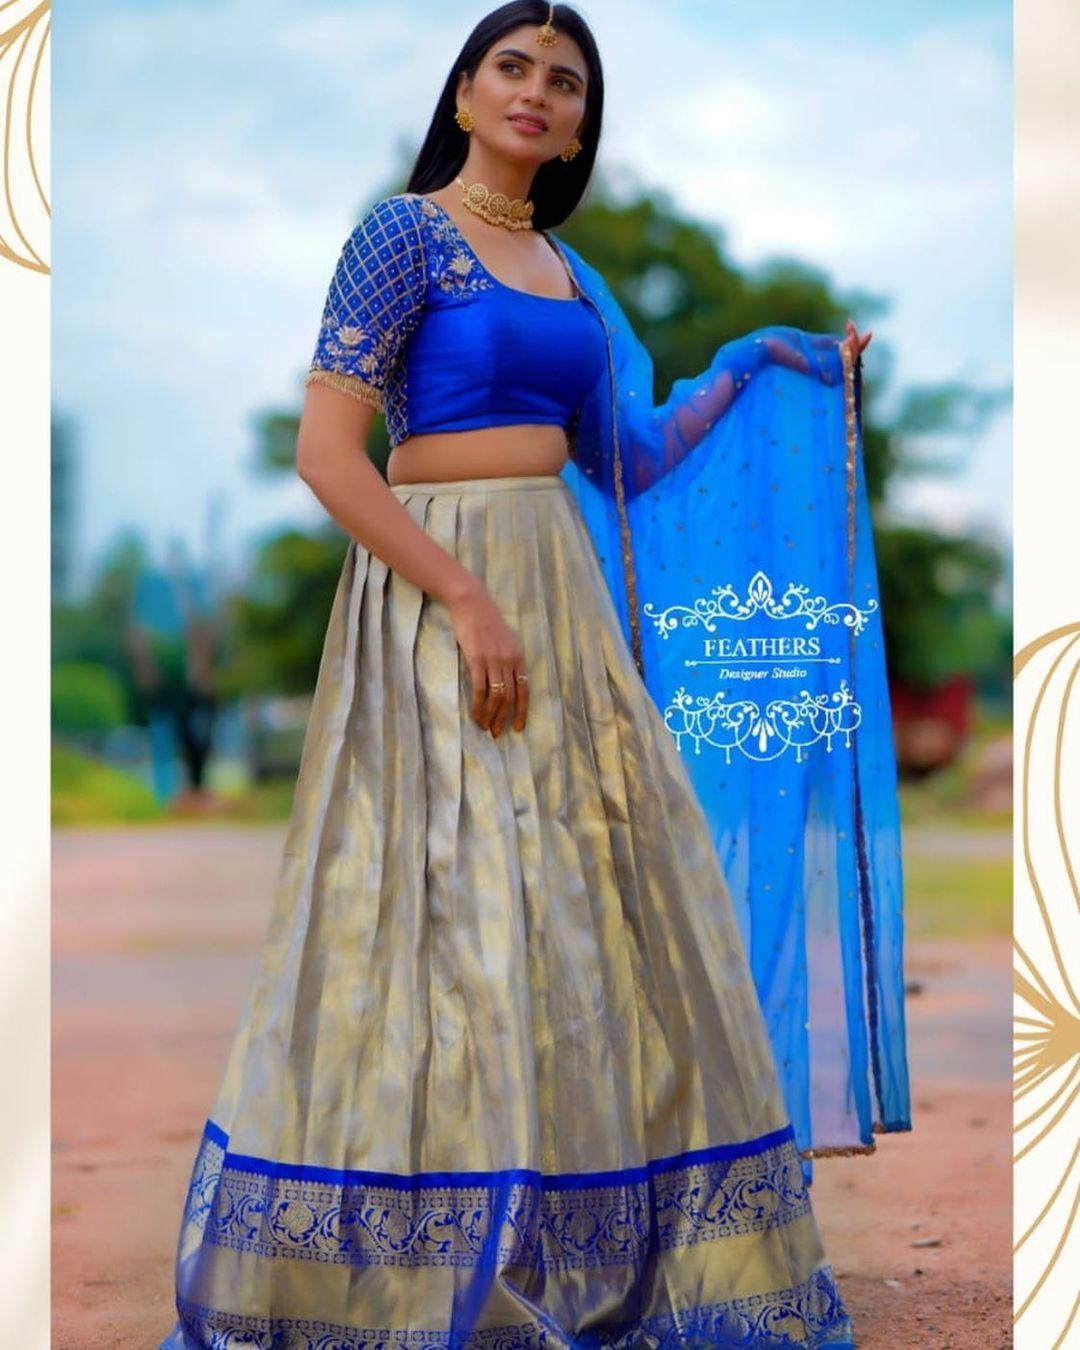 Gorgeous Varsha styled in  Ethinic half saree drape.  Outfit : Feathers designer studio. 2021-10-09